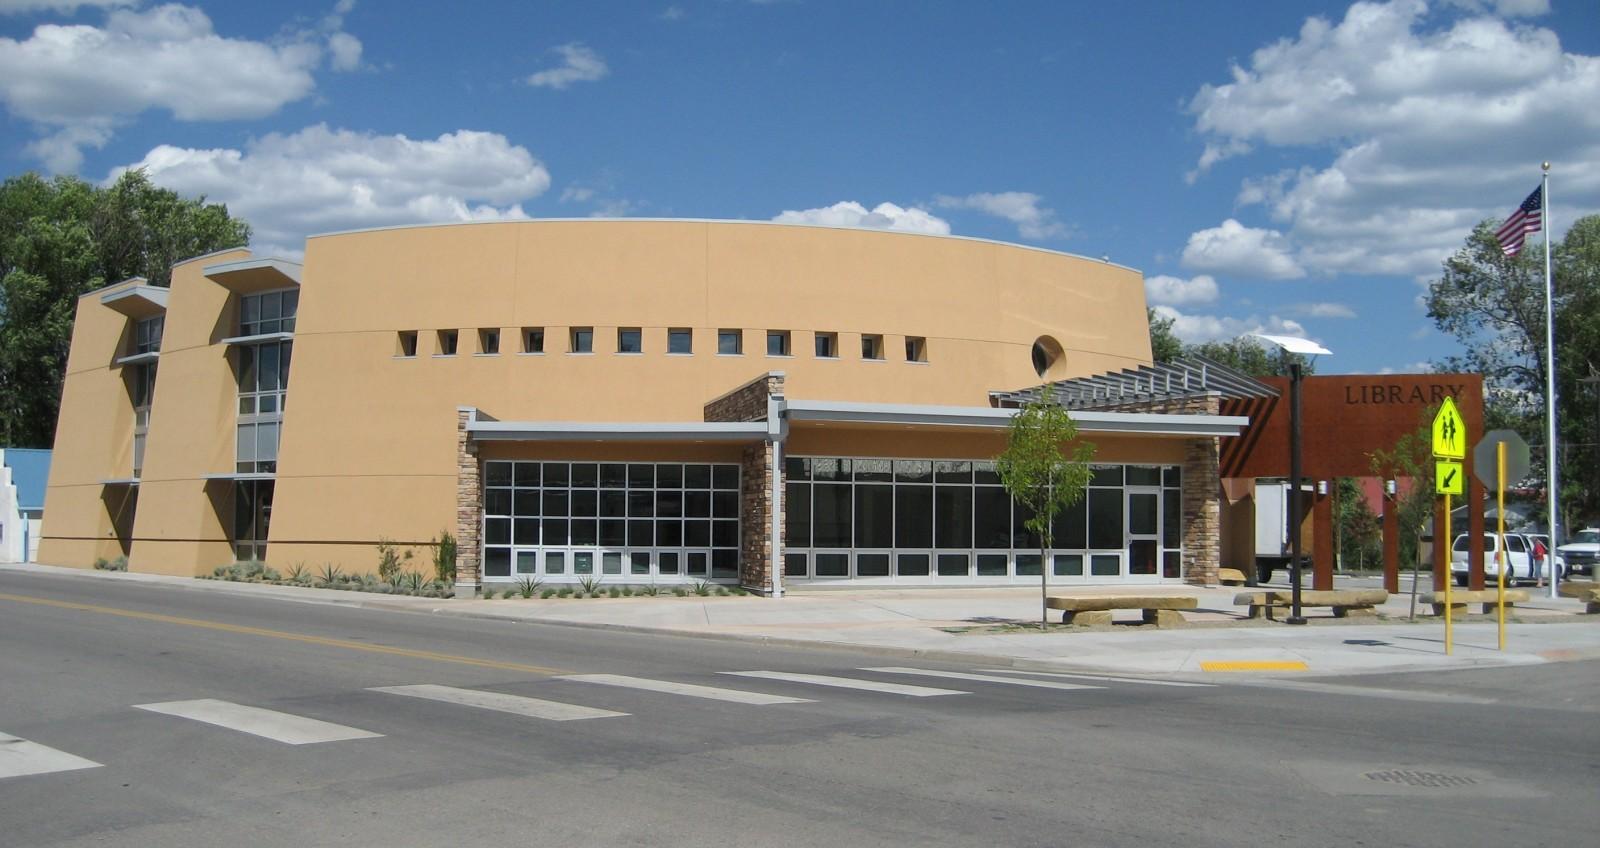 Ignacio Library